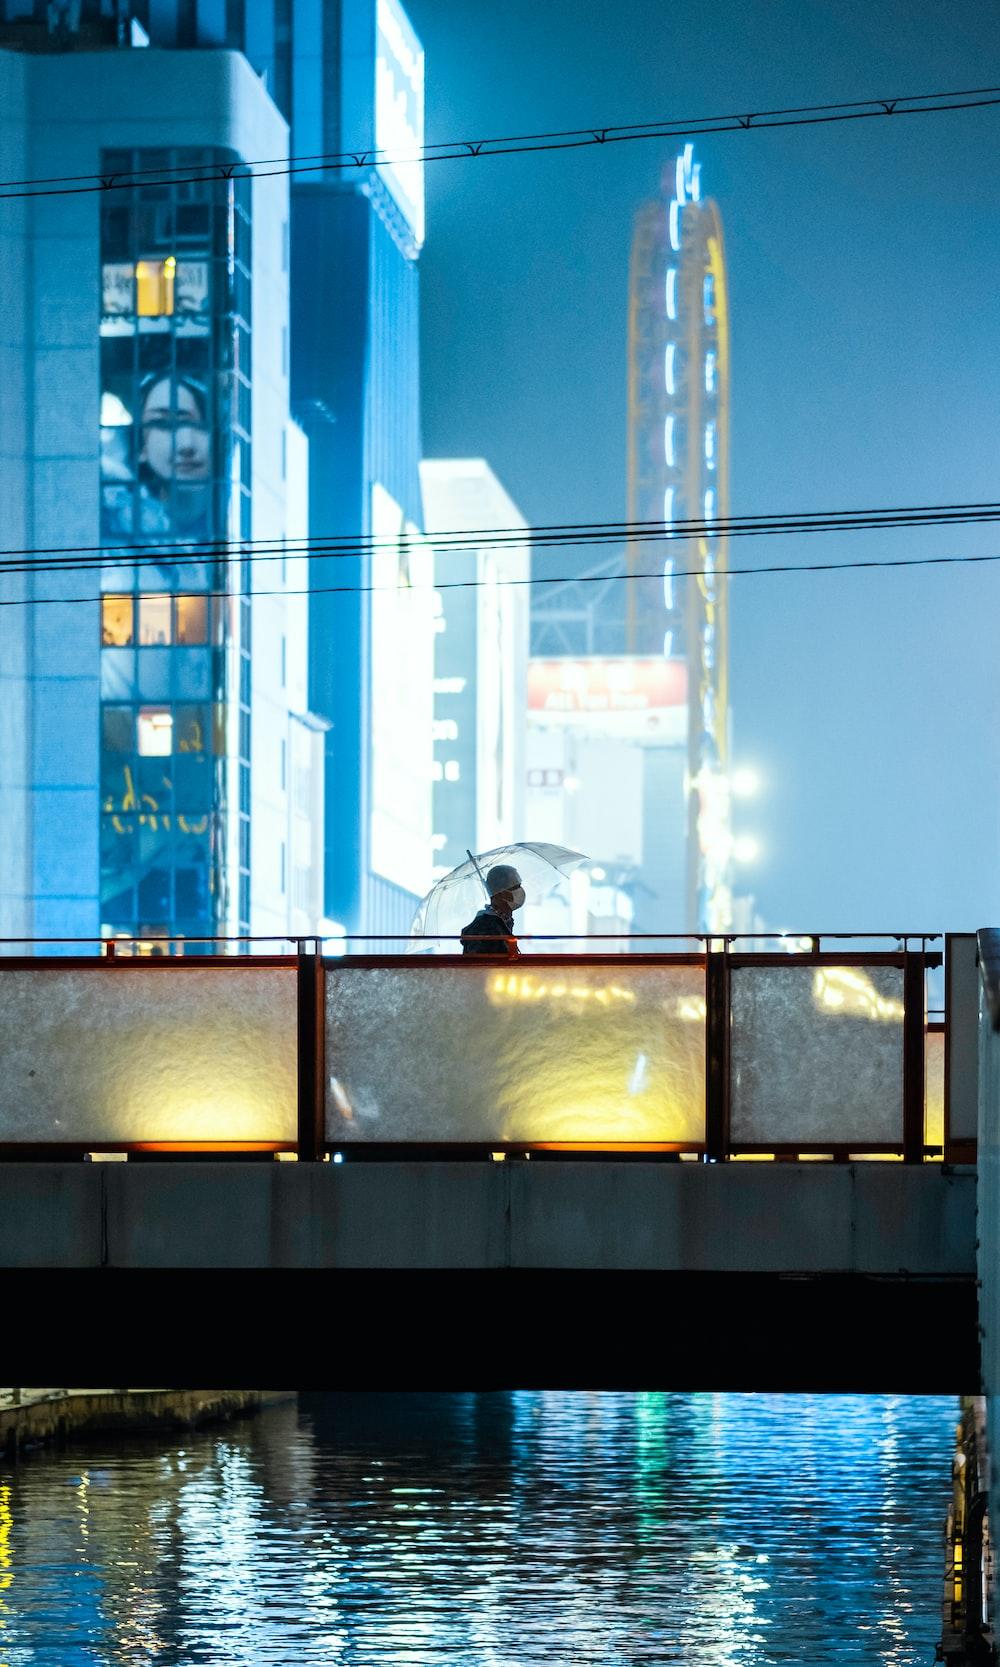 person in black jacket standing near glass window